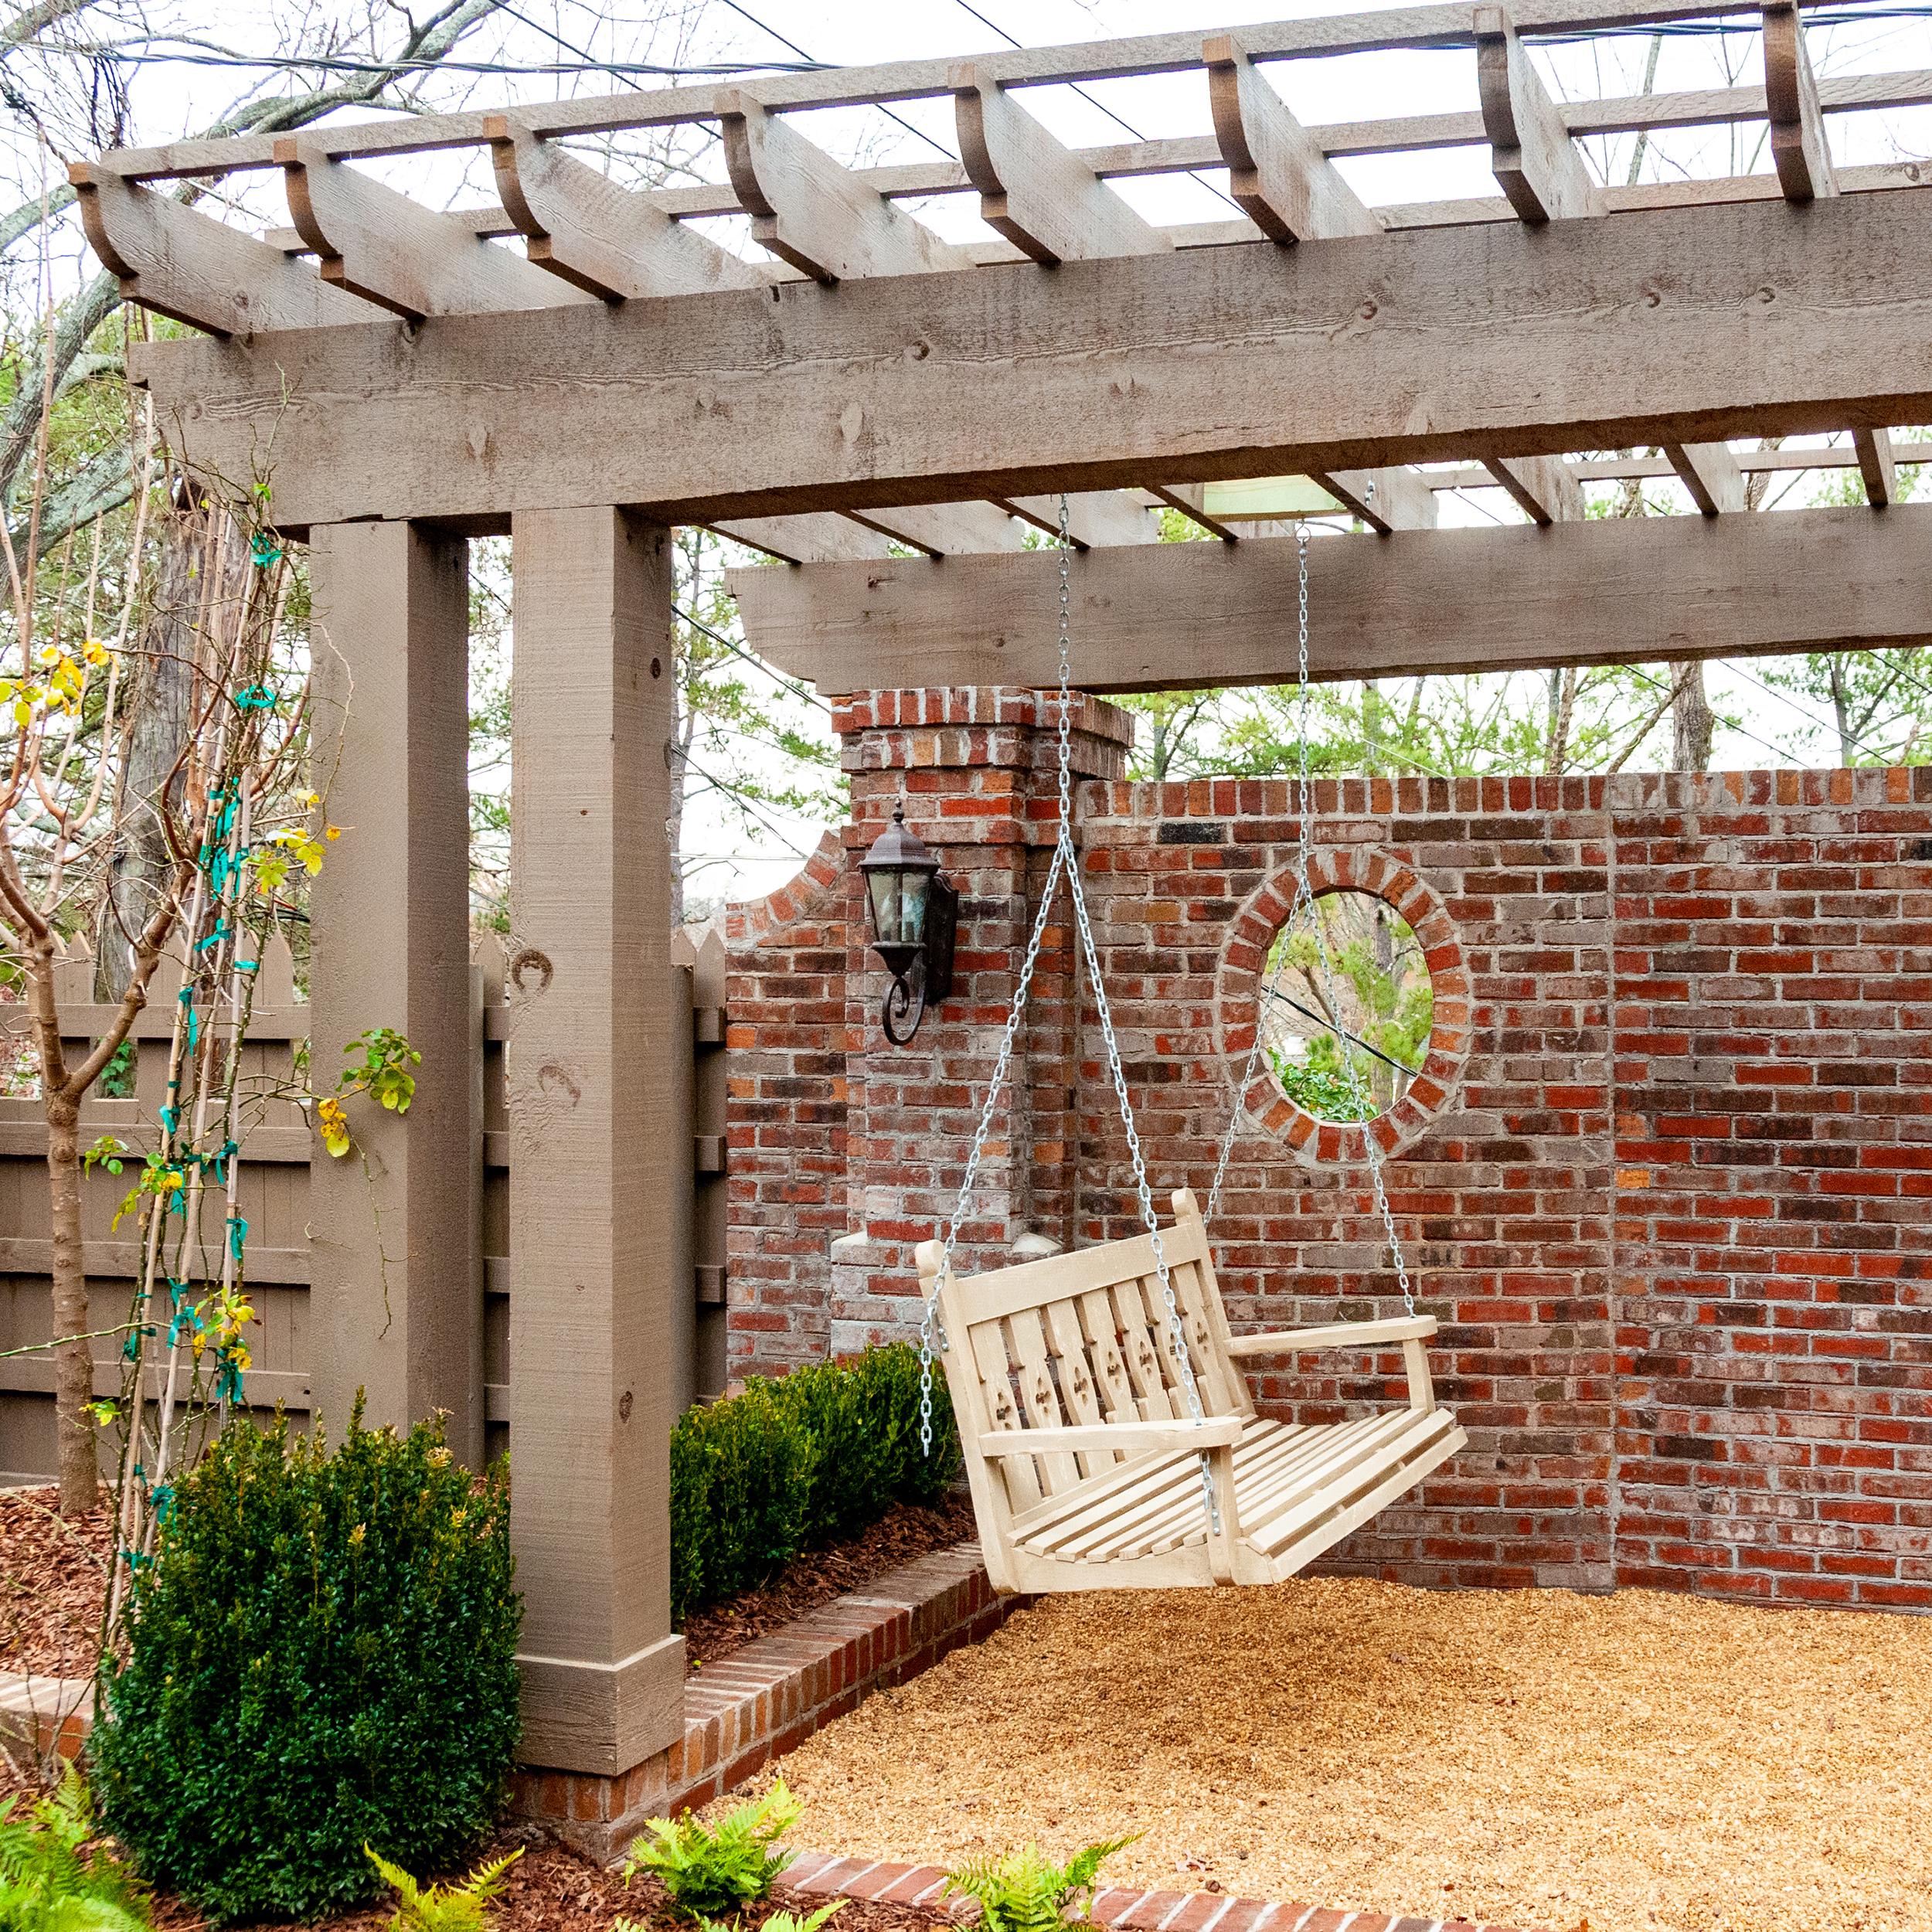 courtyard_garden_09_arbor_trellis_stockade_fence_stone_pea_gravel_path_2500.jpg